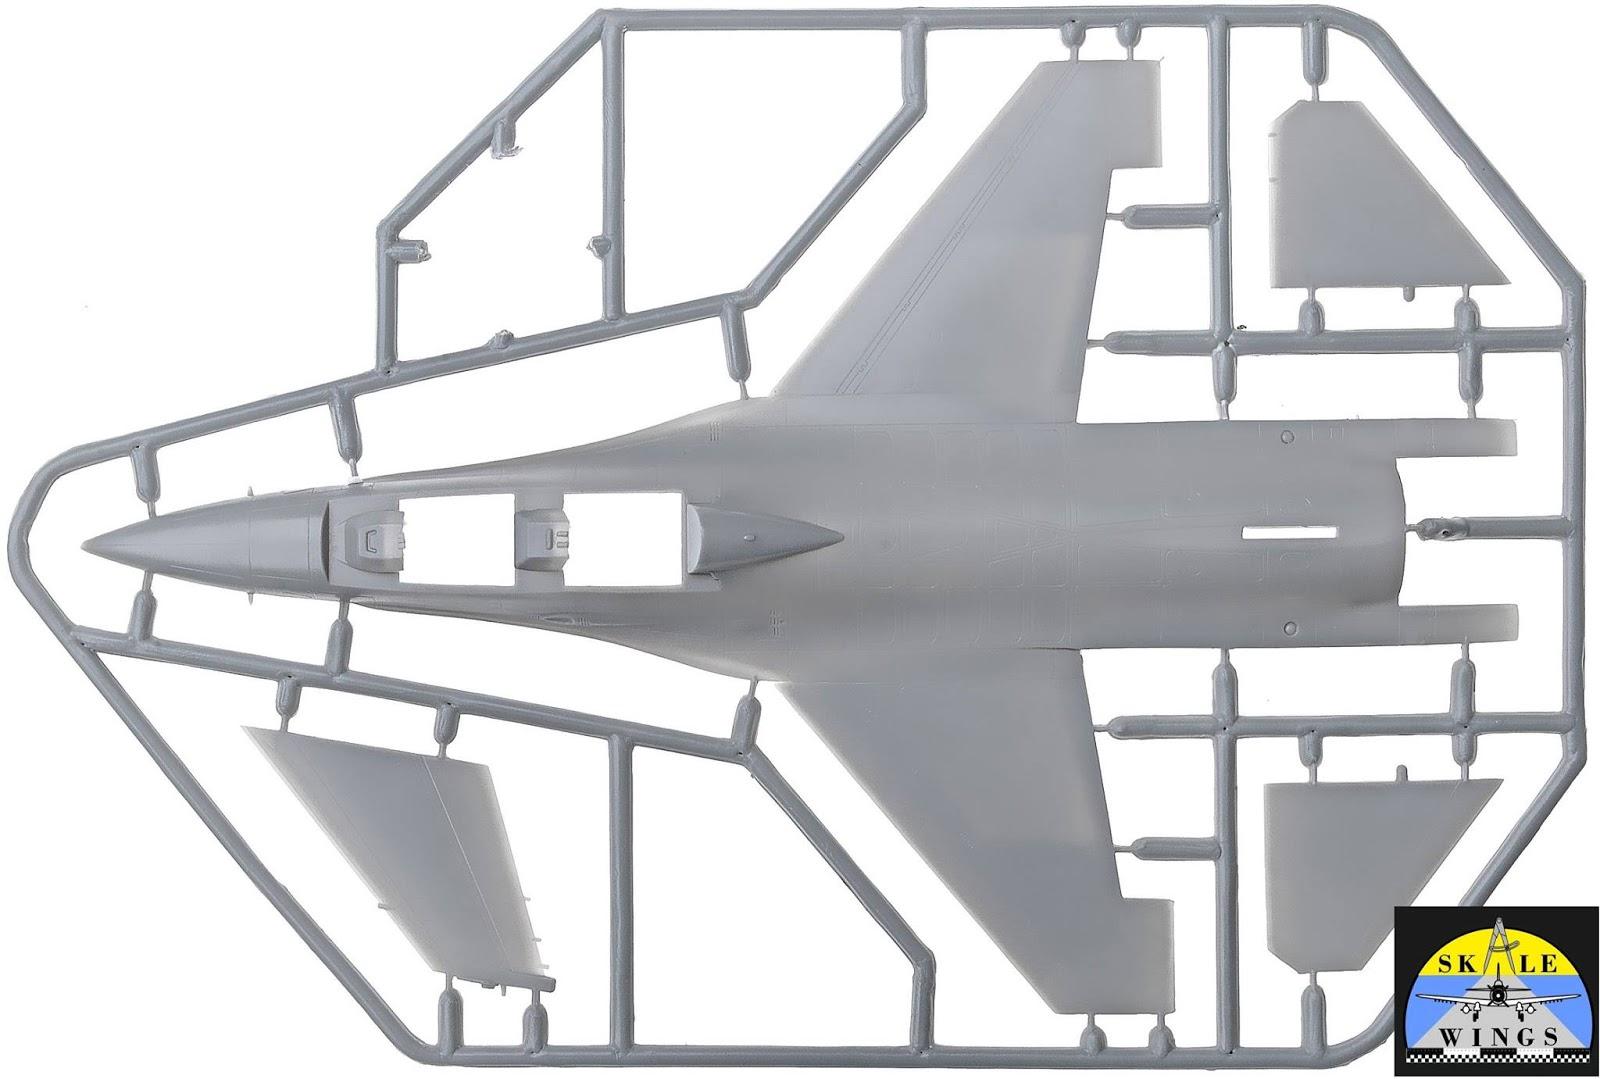 IDS F-16 BARAK SKALE WINGS PLASTIC KIT 1//72